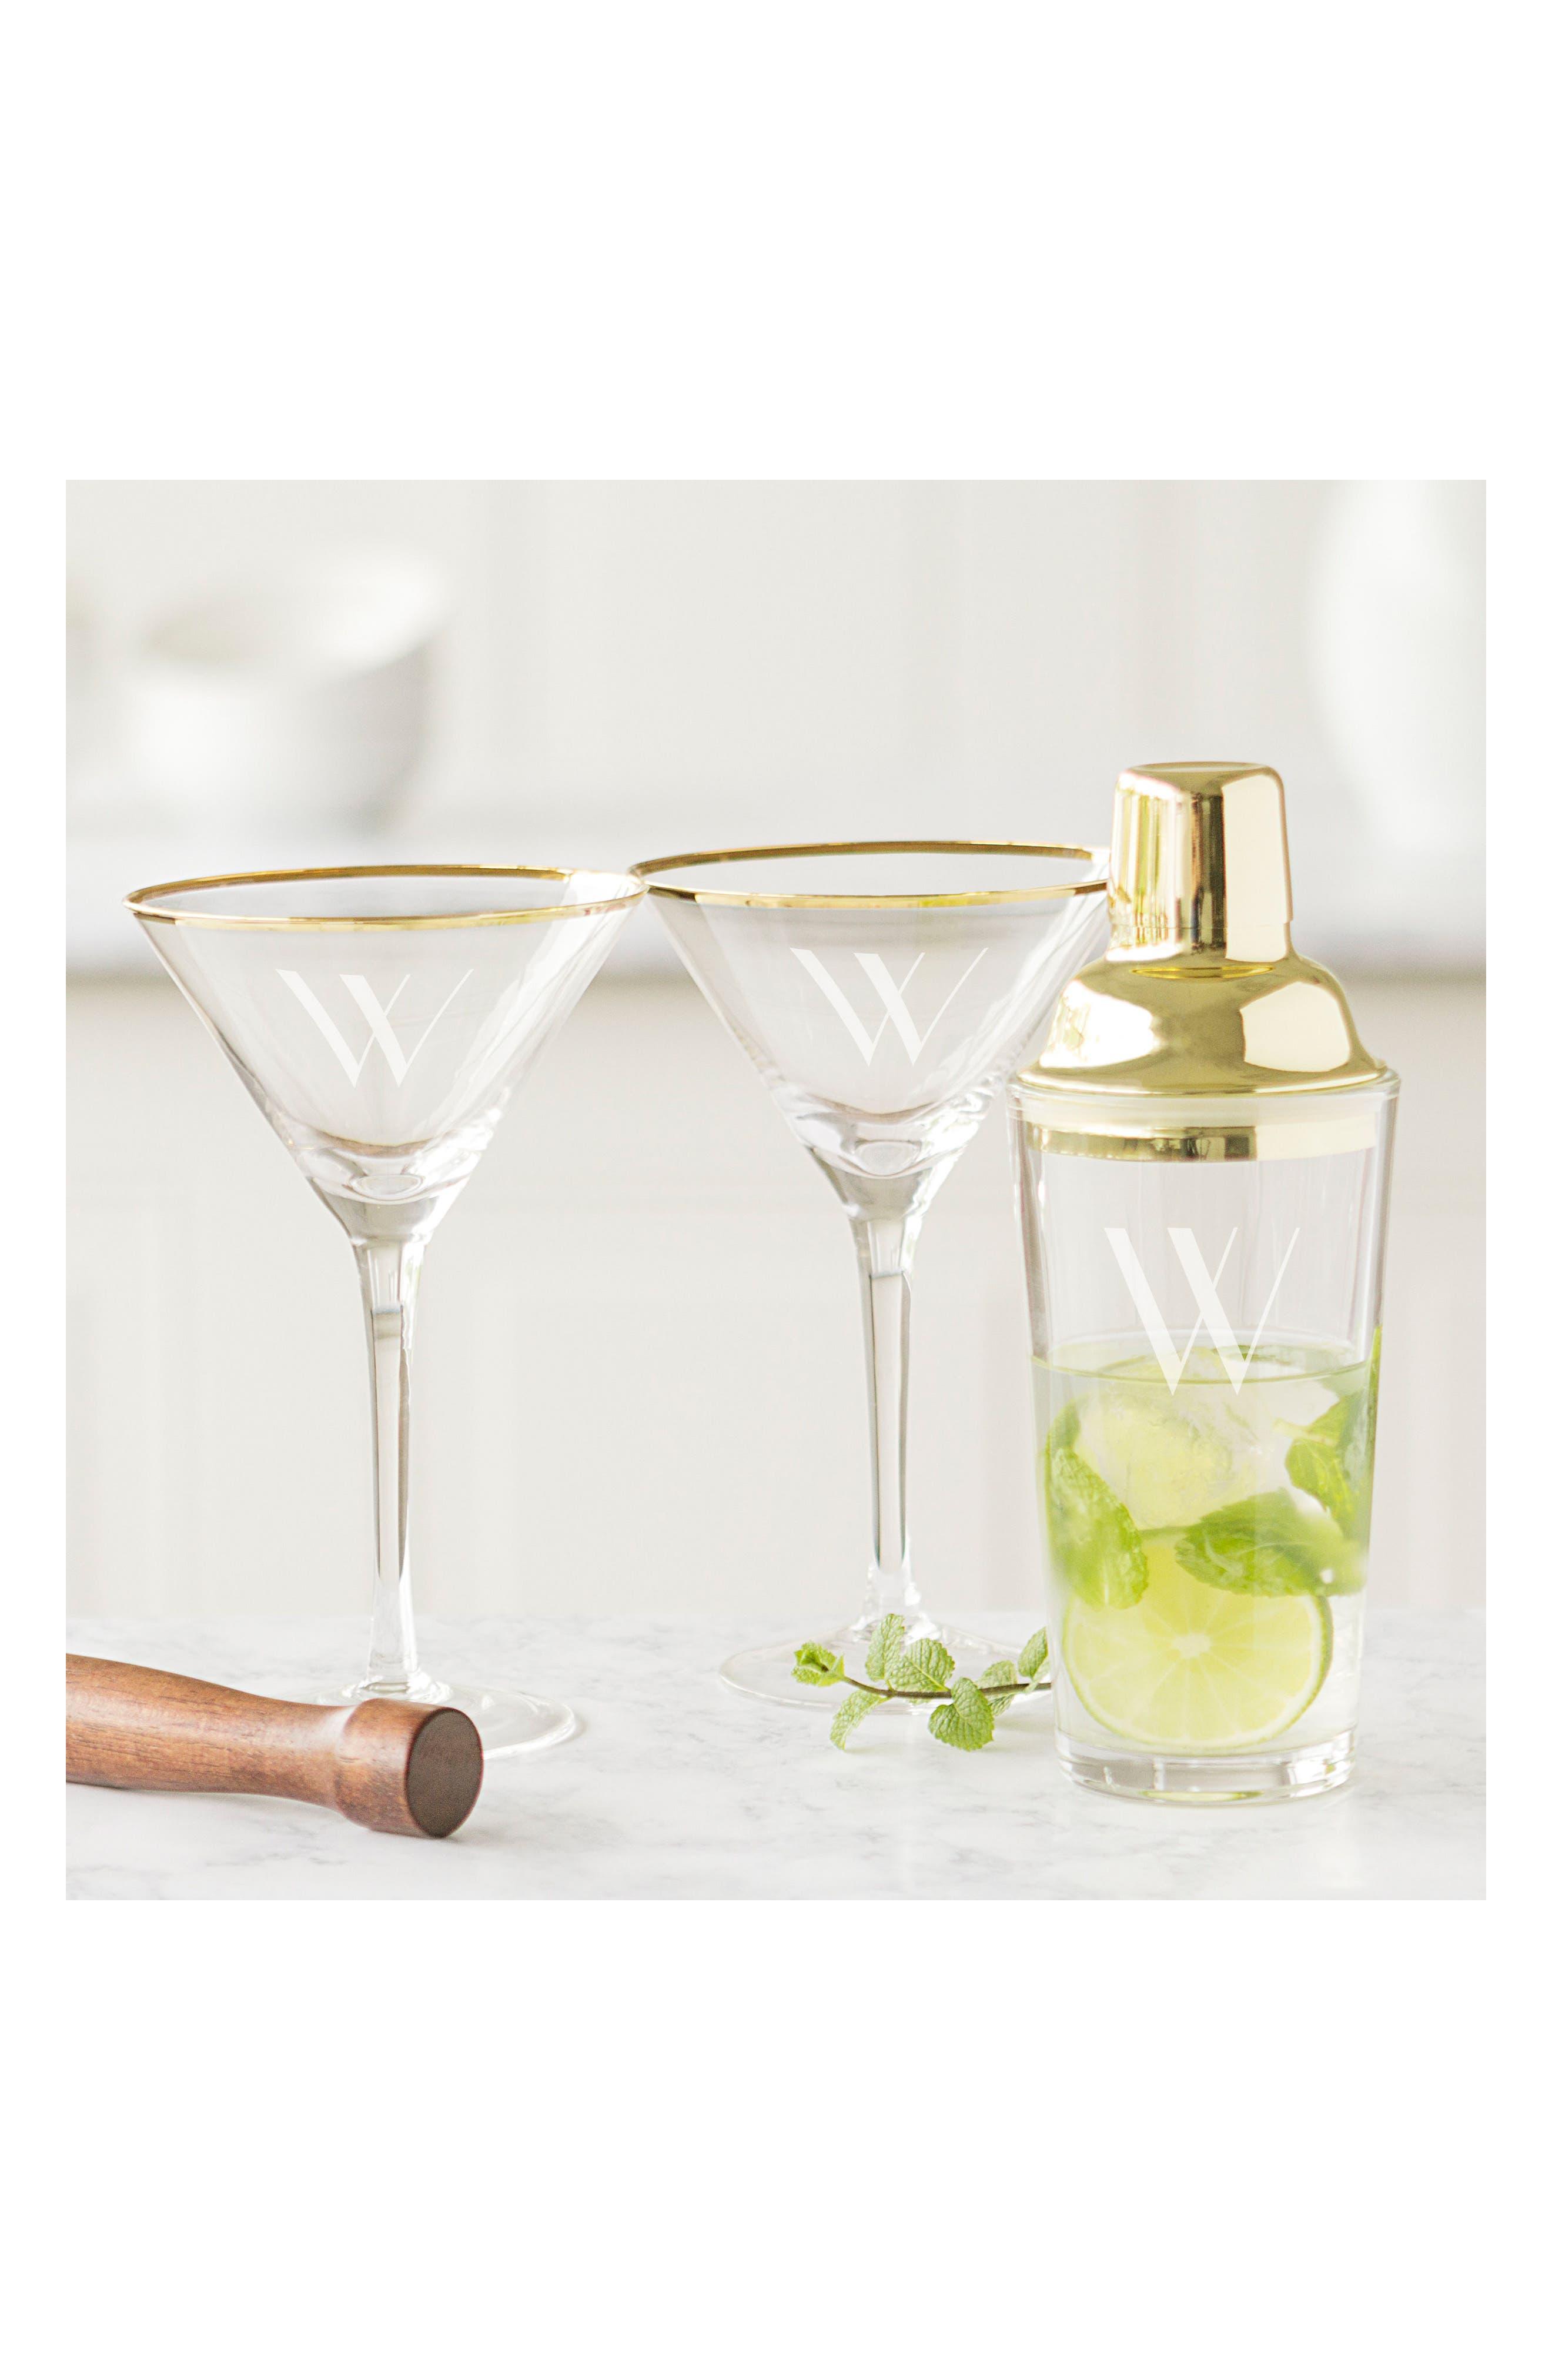 Monogram Martini Glasses & Goldtone Cocktail Shaker,                             Alternate thumbnail 7, color,